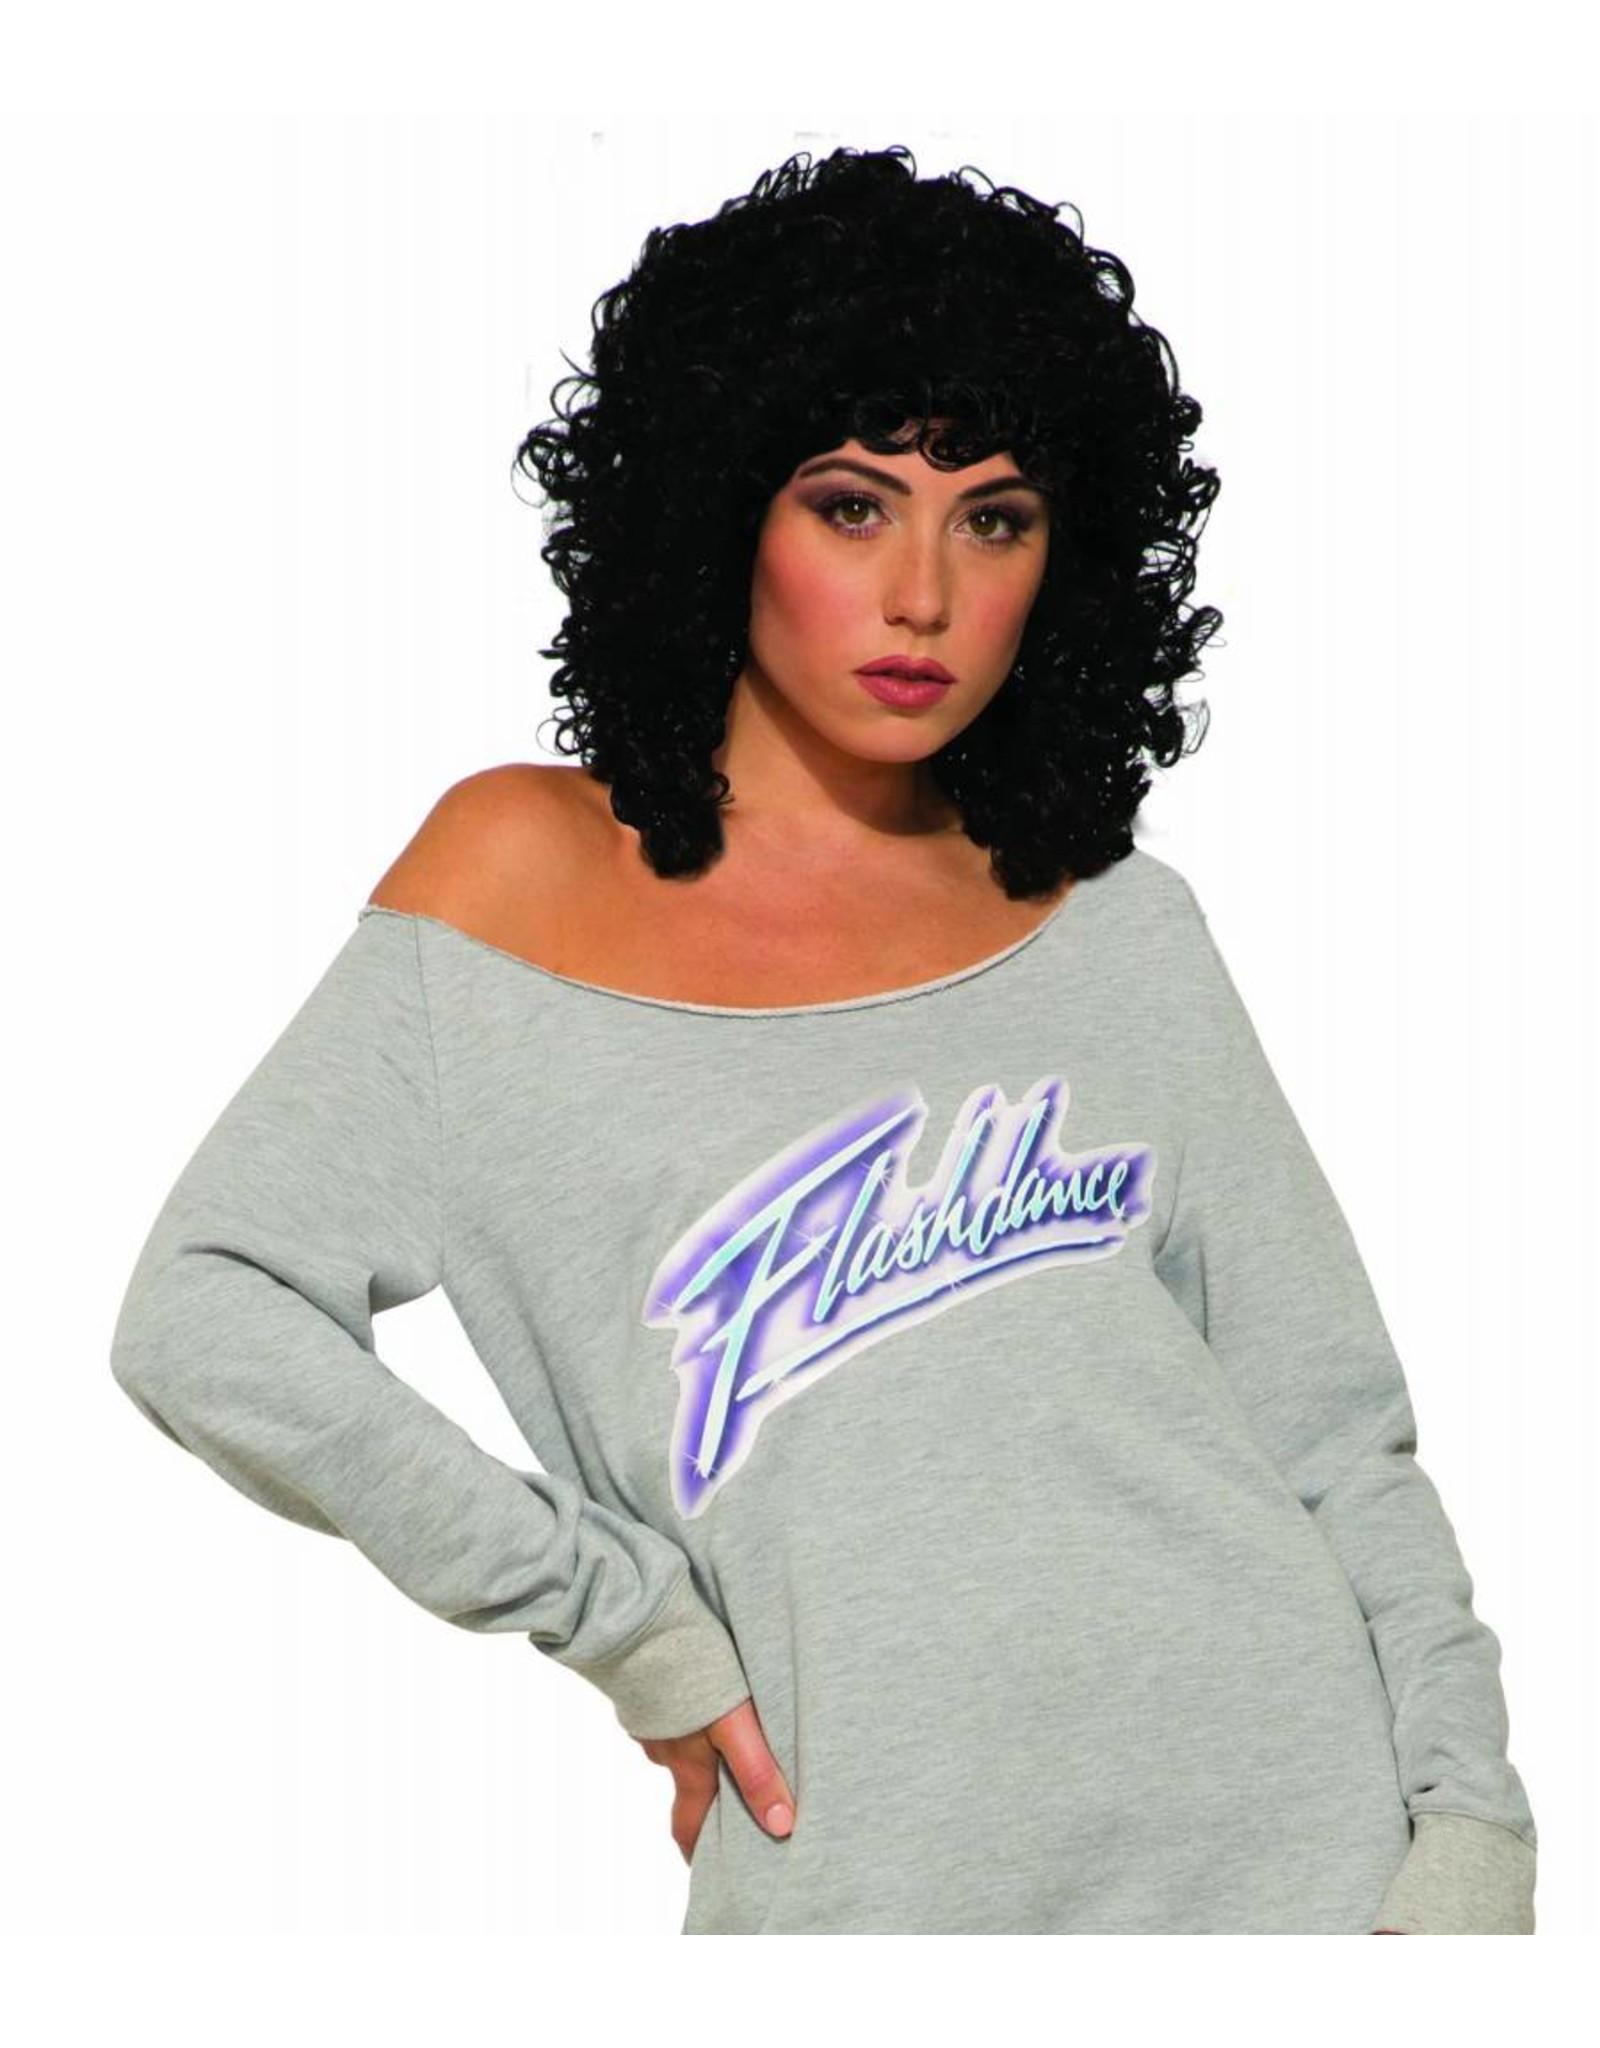 Forum Flashdance Wig